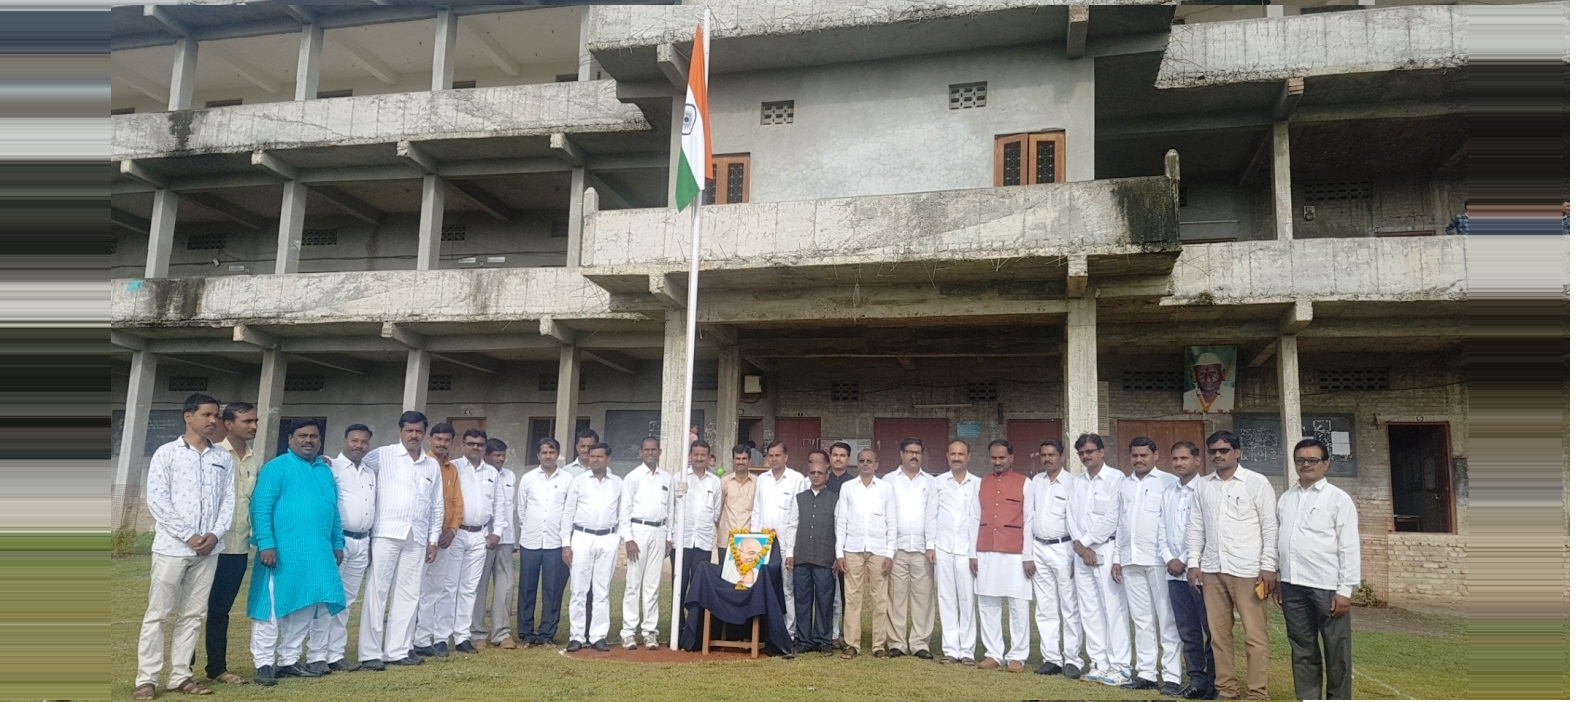 Sant Tukaram College of Arts and Science, Parbhani